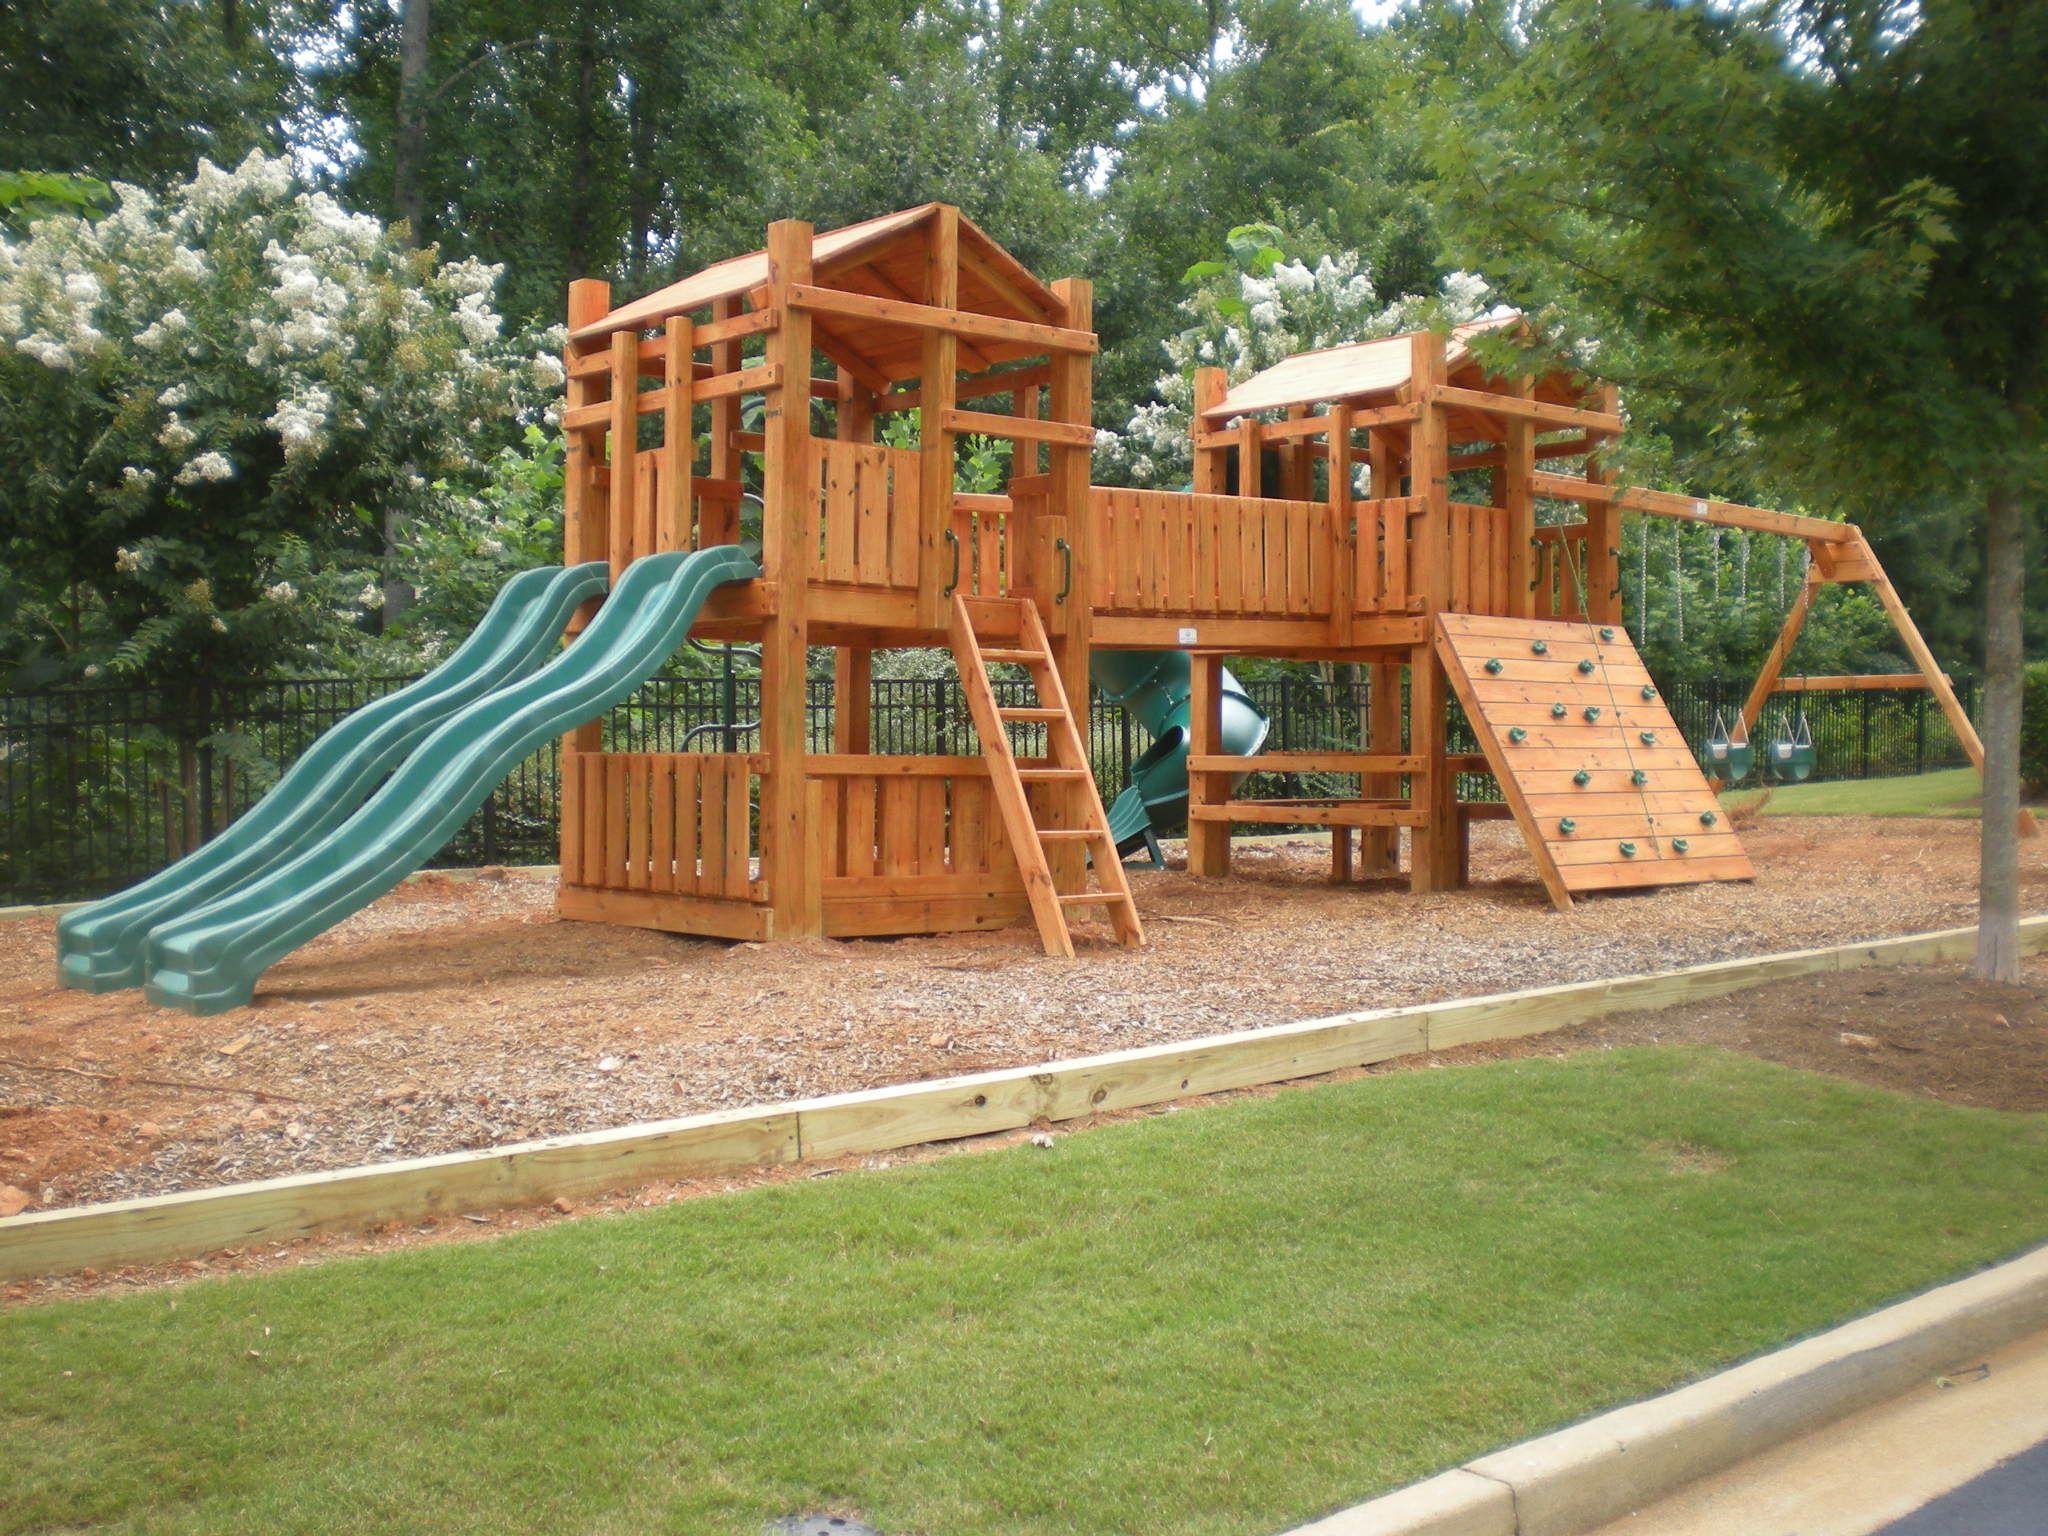 Backyard Playground Sets Outside Play Equipment Design Ideas